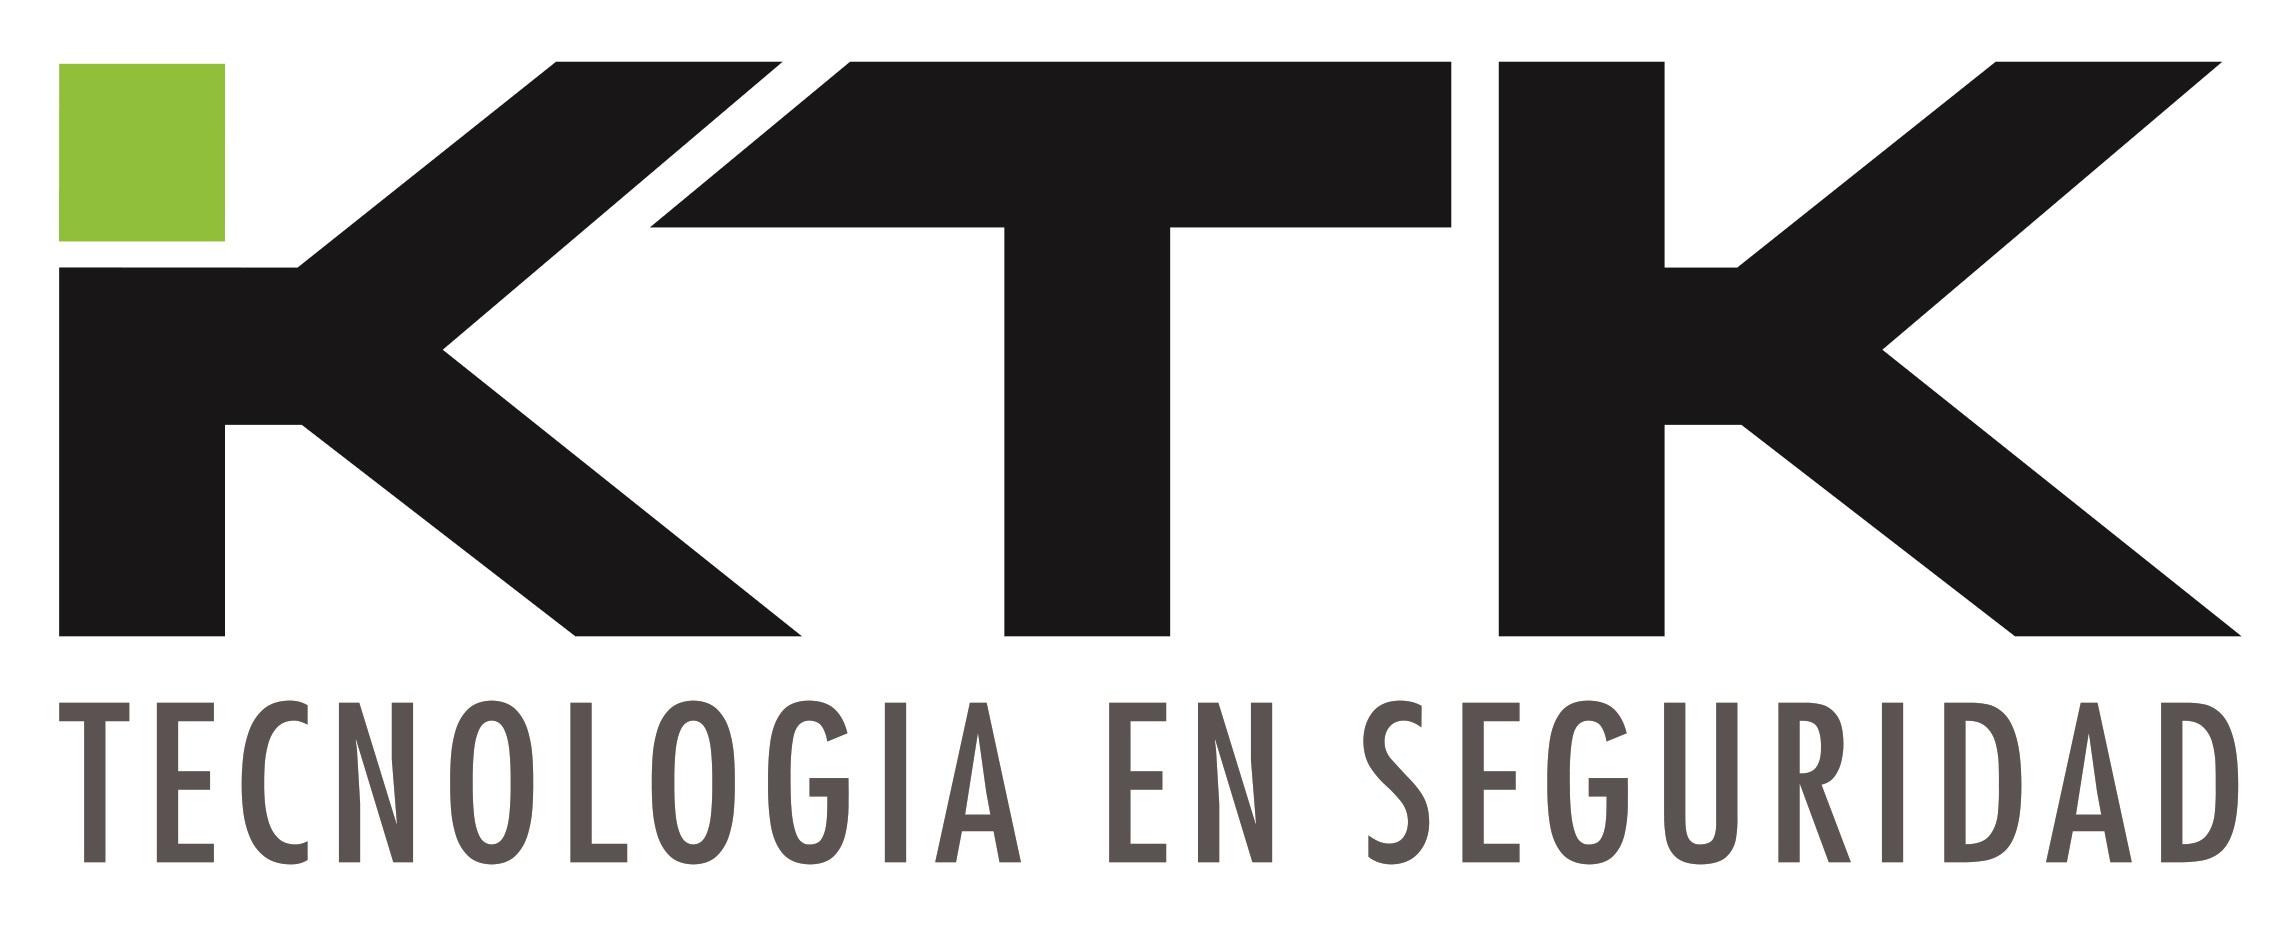 logotipo-ktk-pos-1.jpg